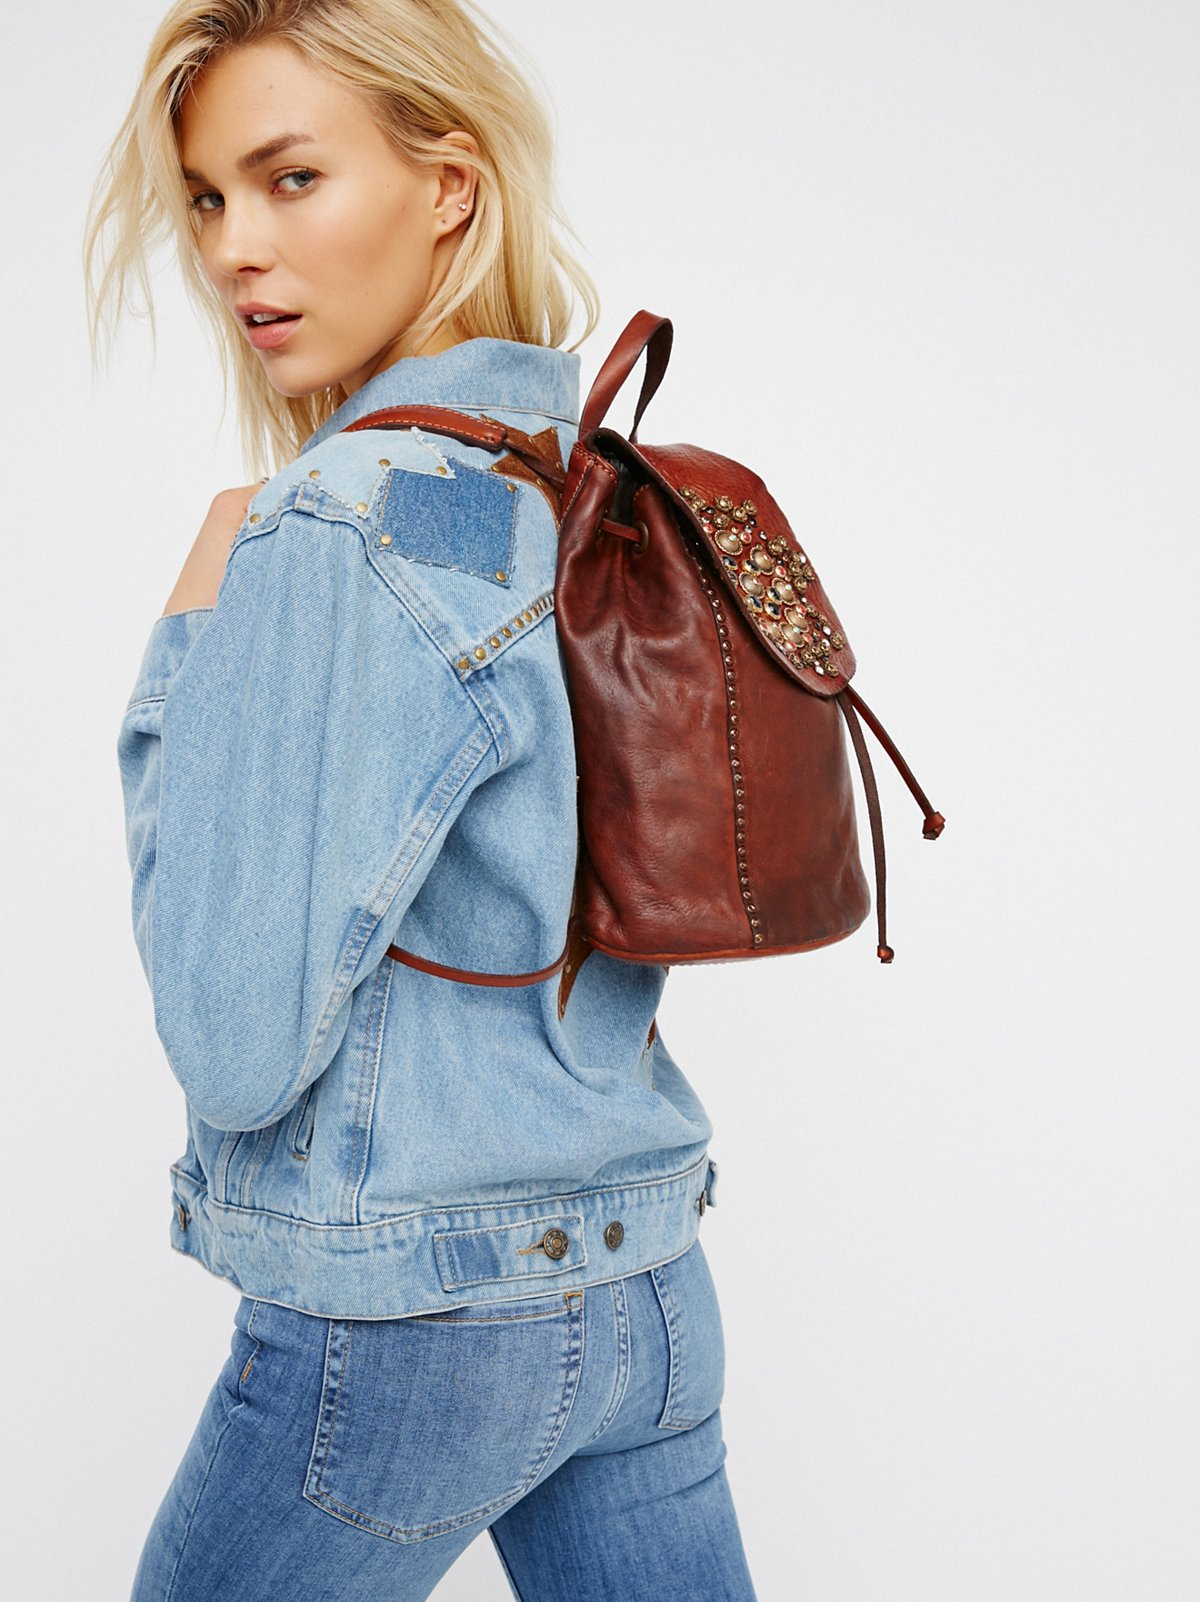 Sacra Studded Backpack